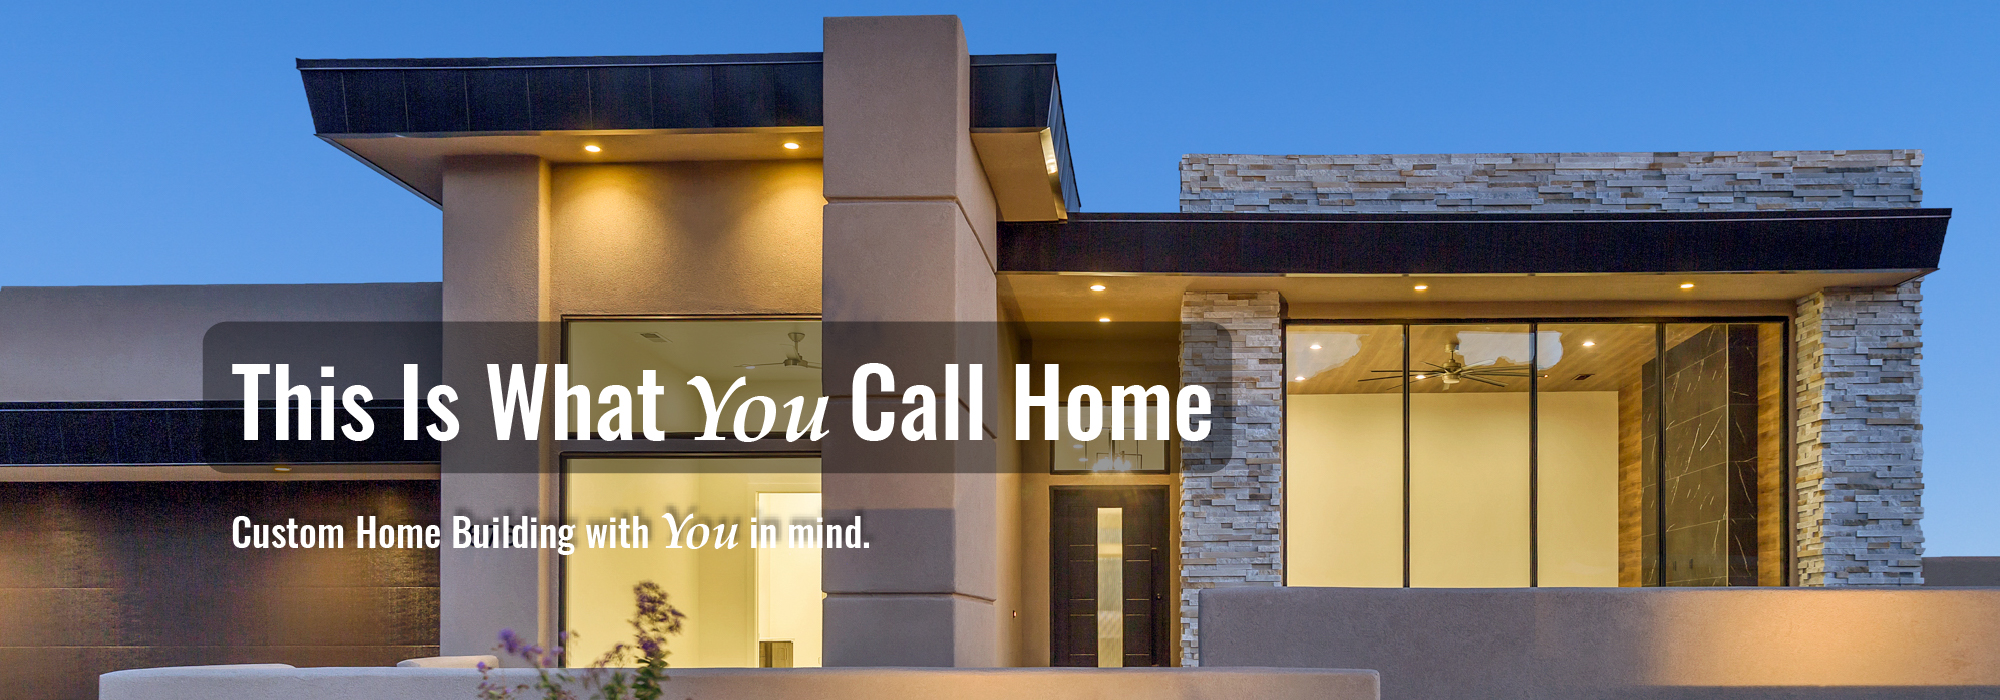 Cool_Homes_Slider1